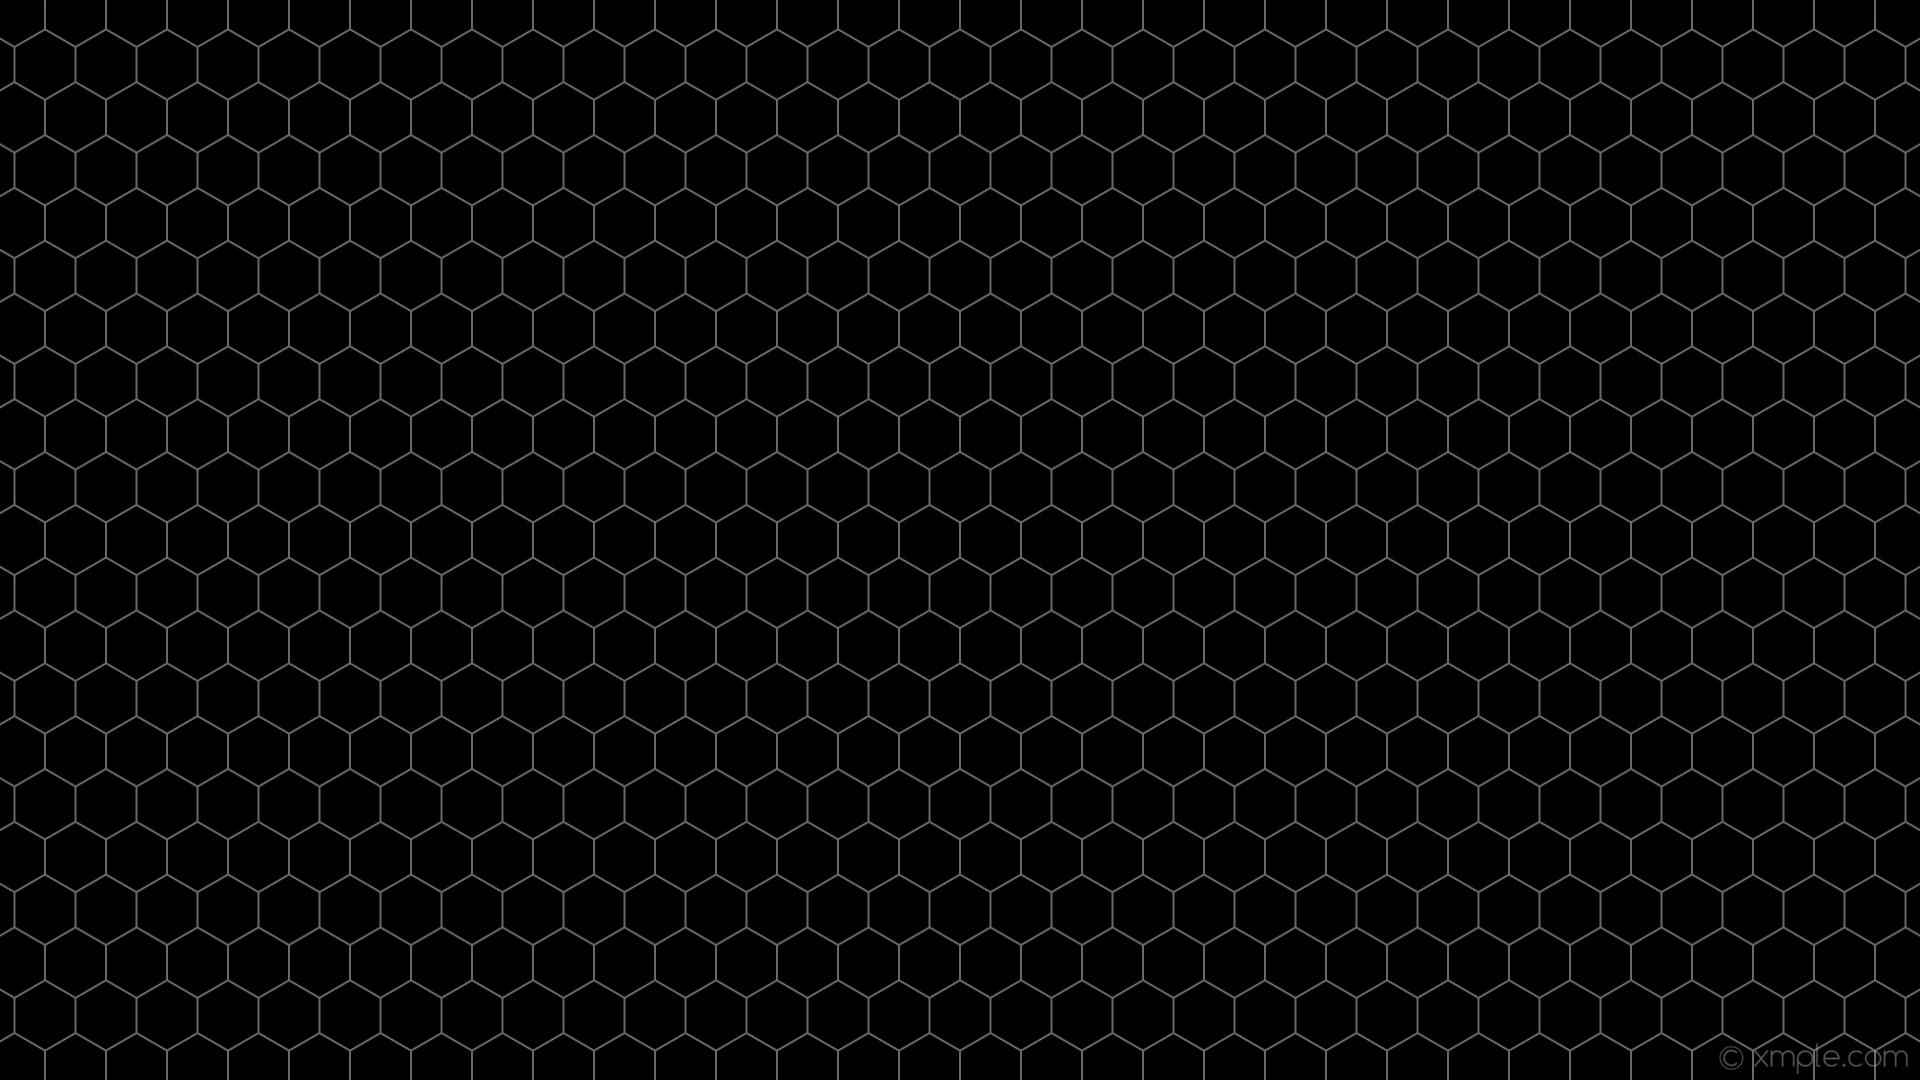 wallpaper grey beehive hexagon black drop shadow dim gray #696969 #000000  45° 2px